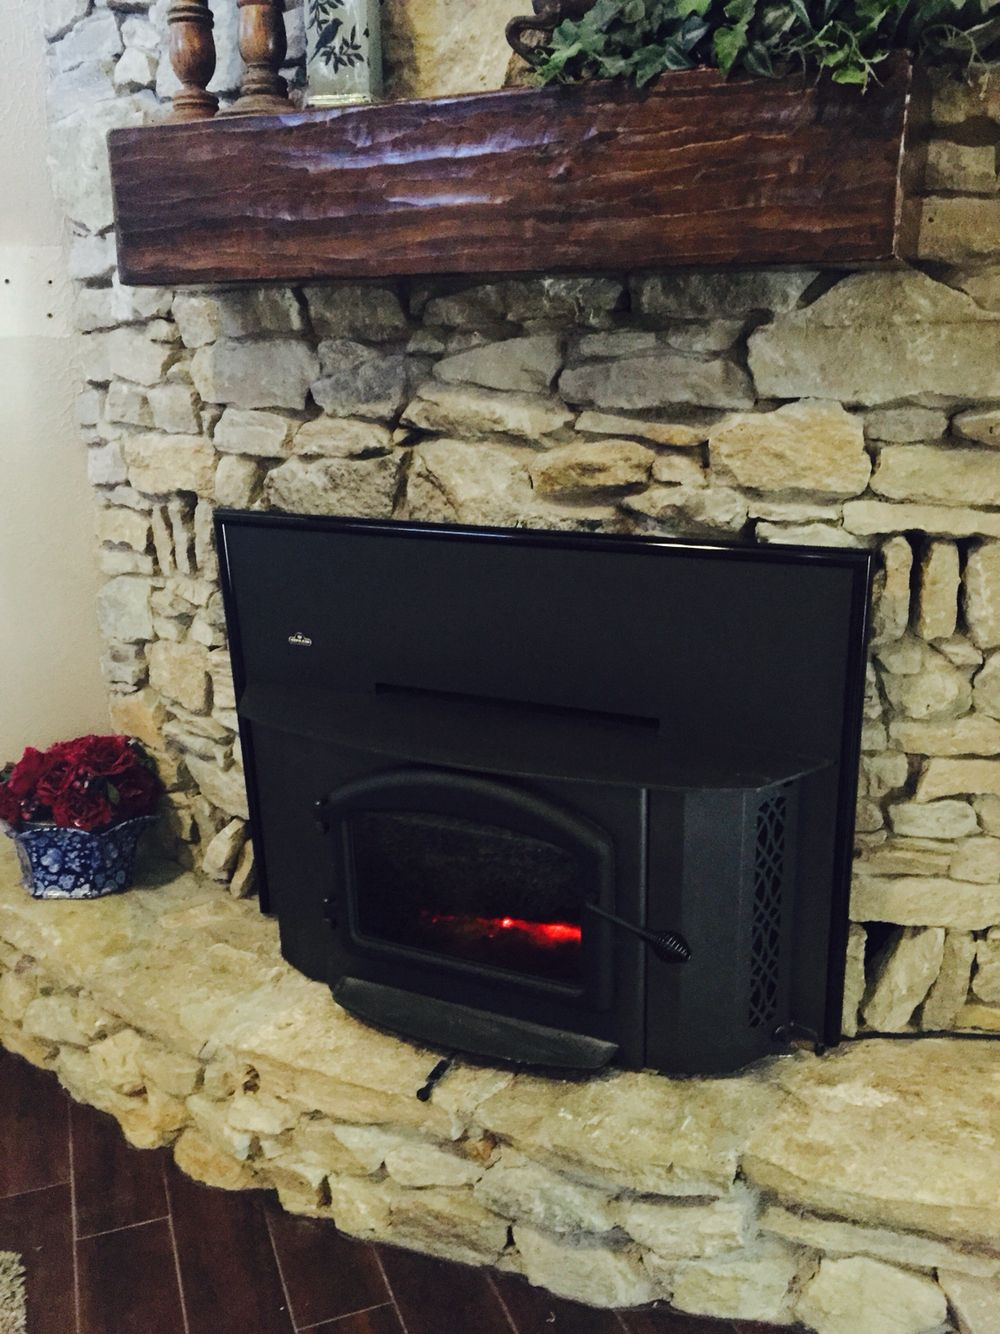 DIY fireplace mantel (rough hewn look)  I used poplar 1 1/4